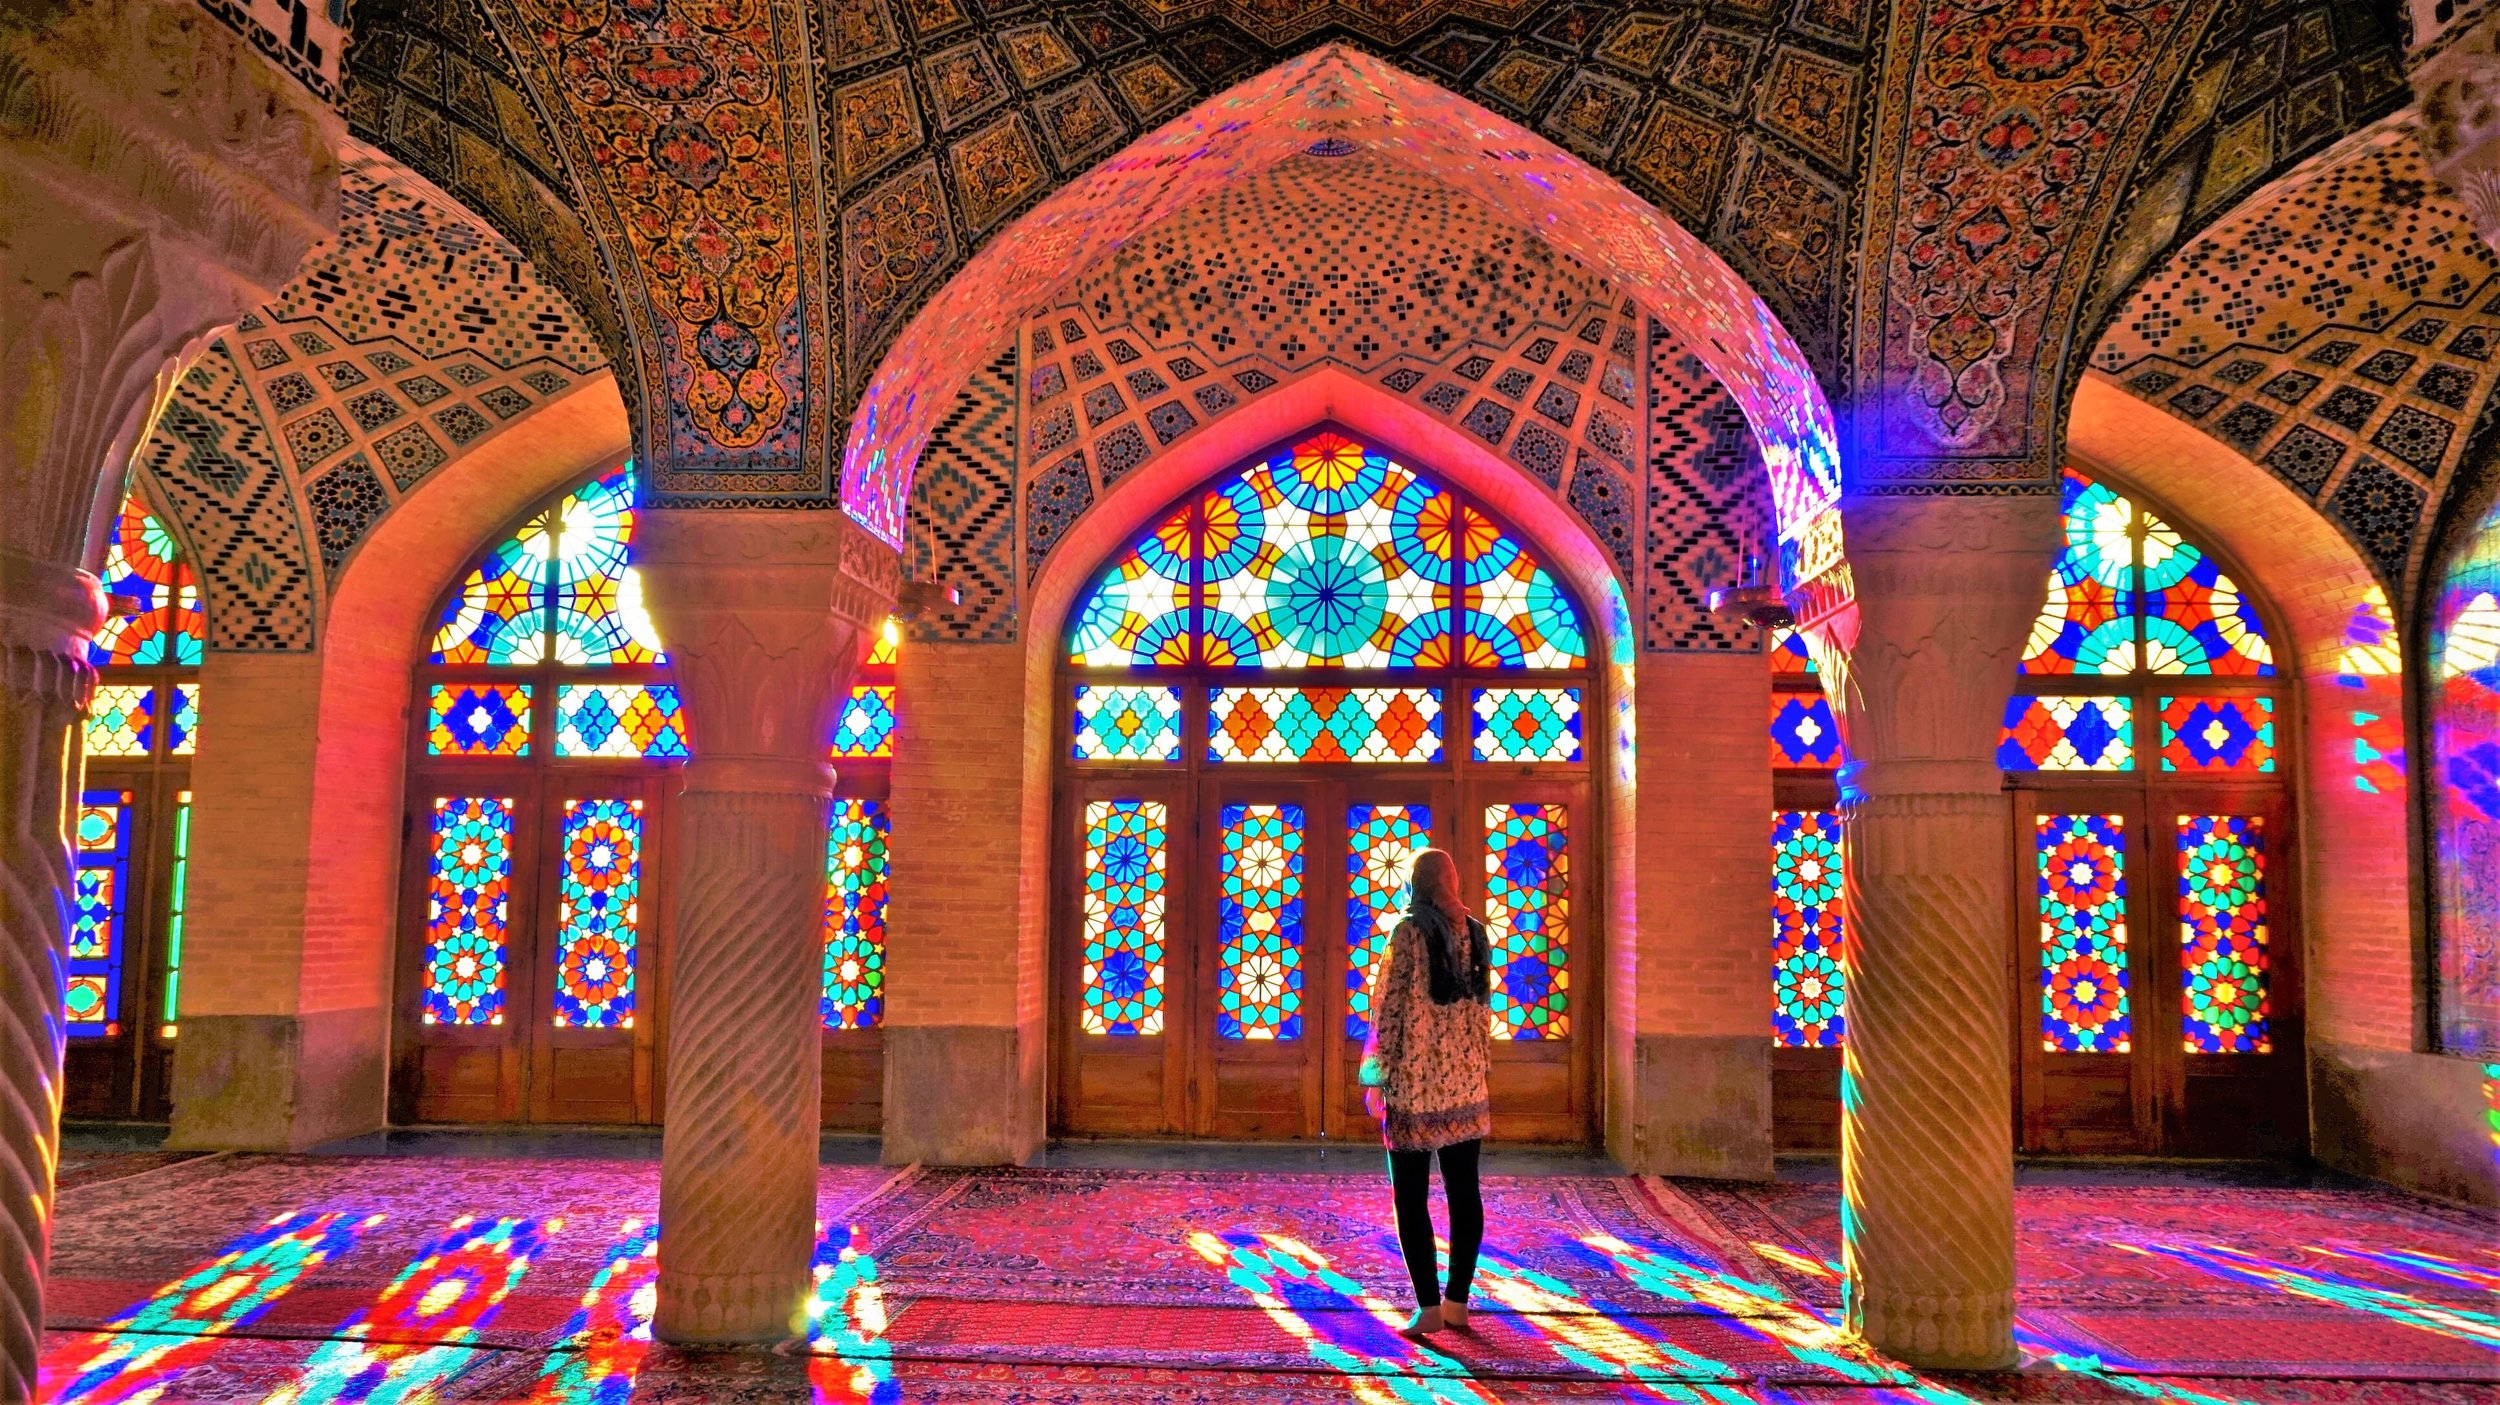 sunrise at the pink mosque iran-min.jpg